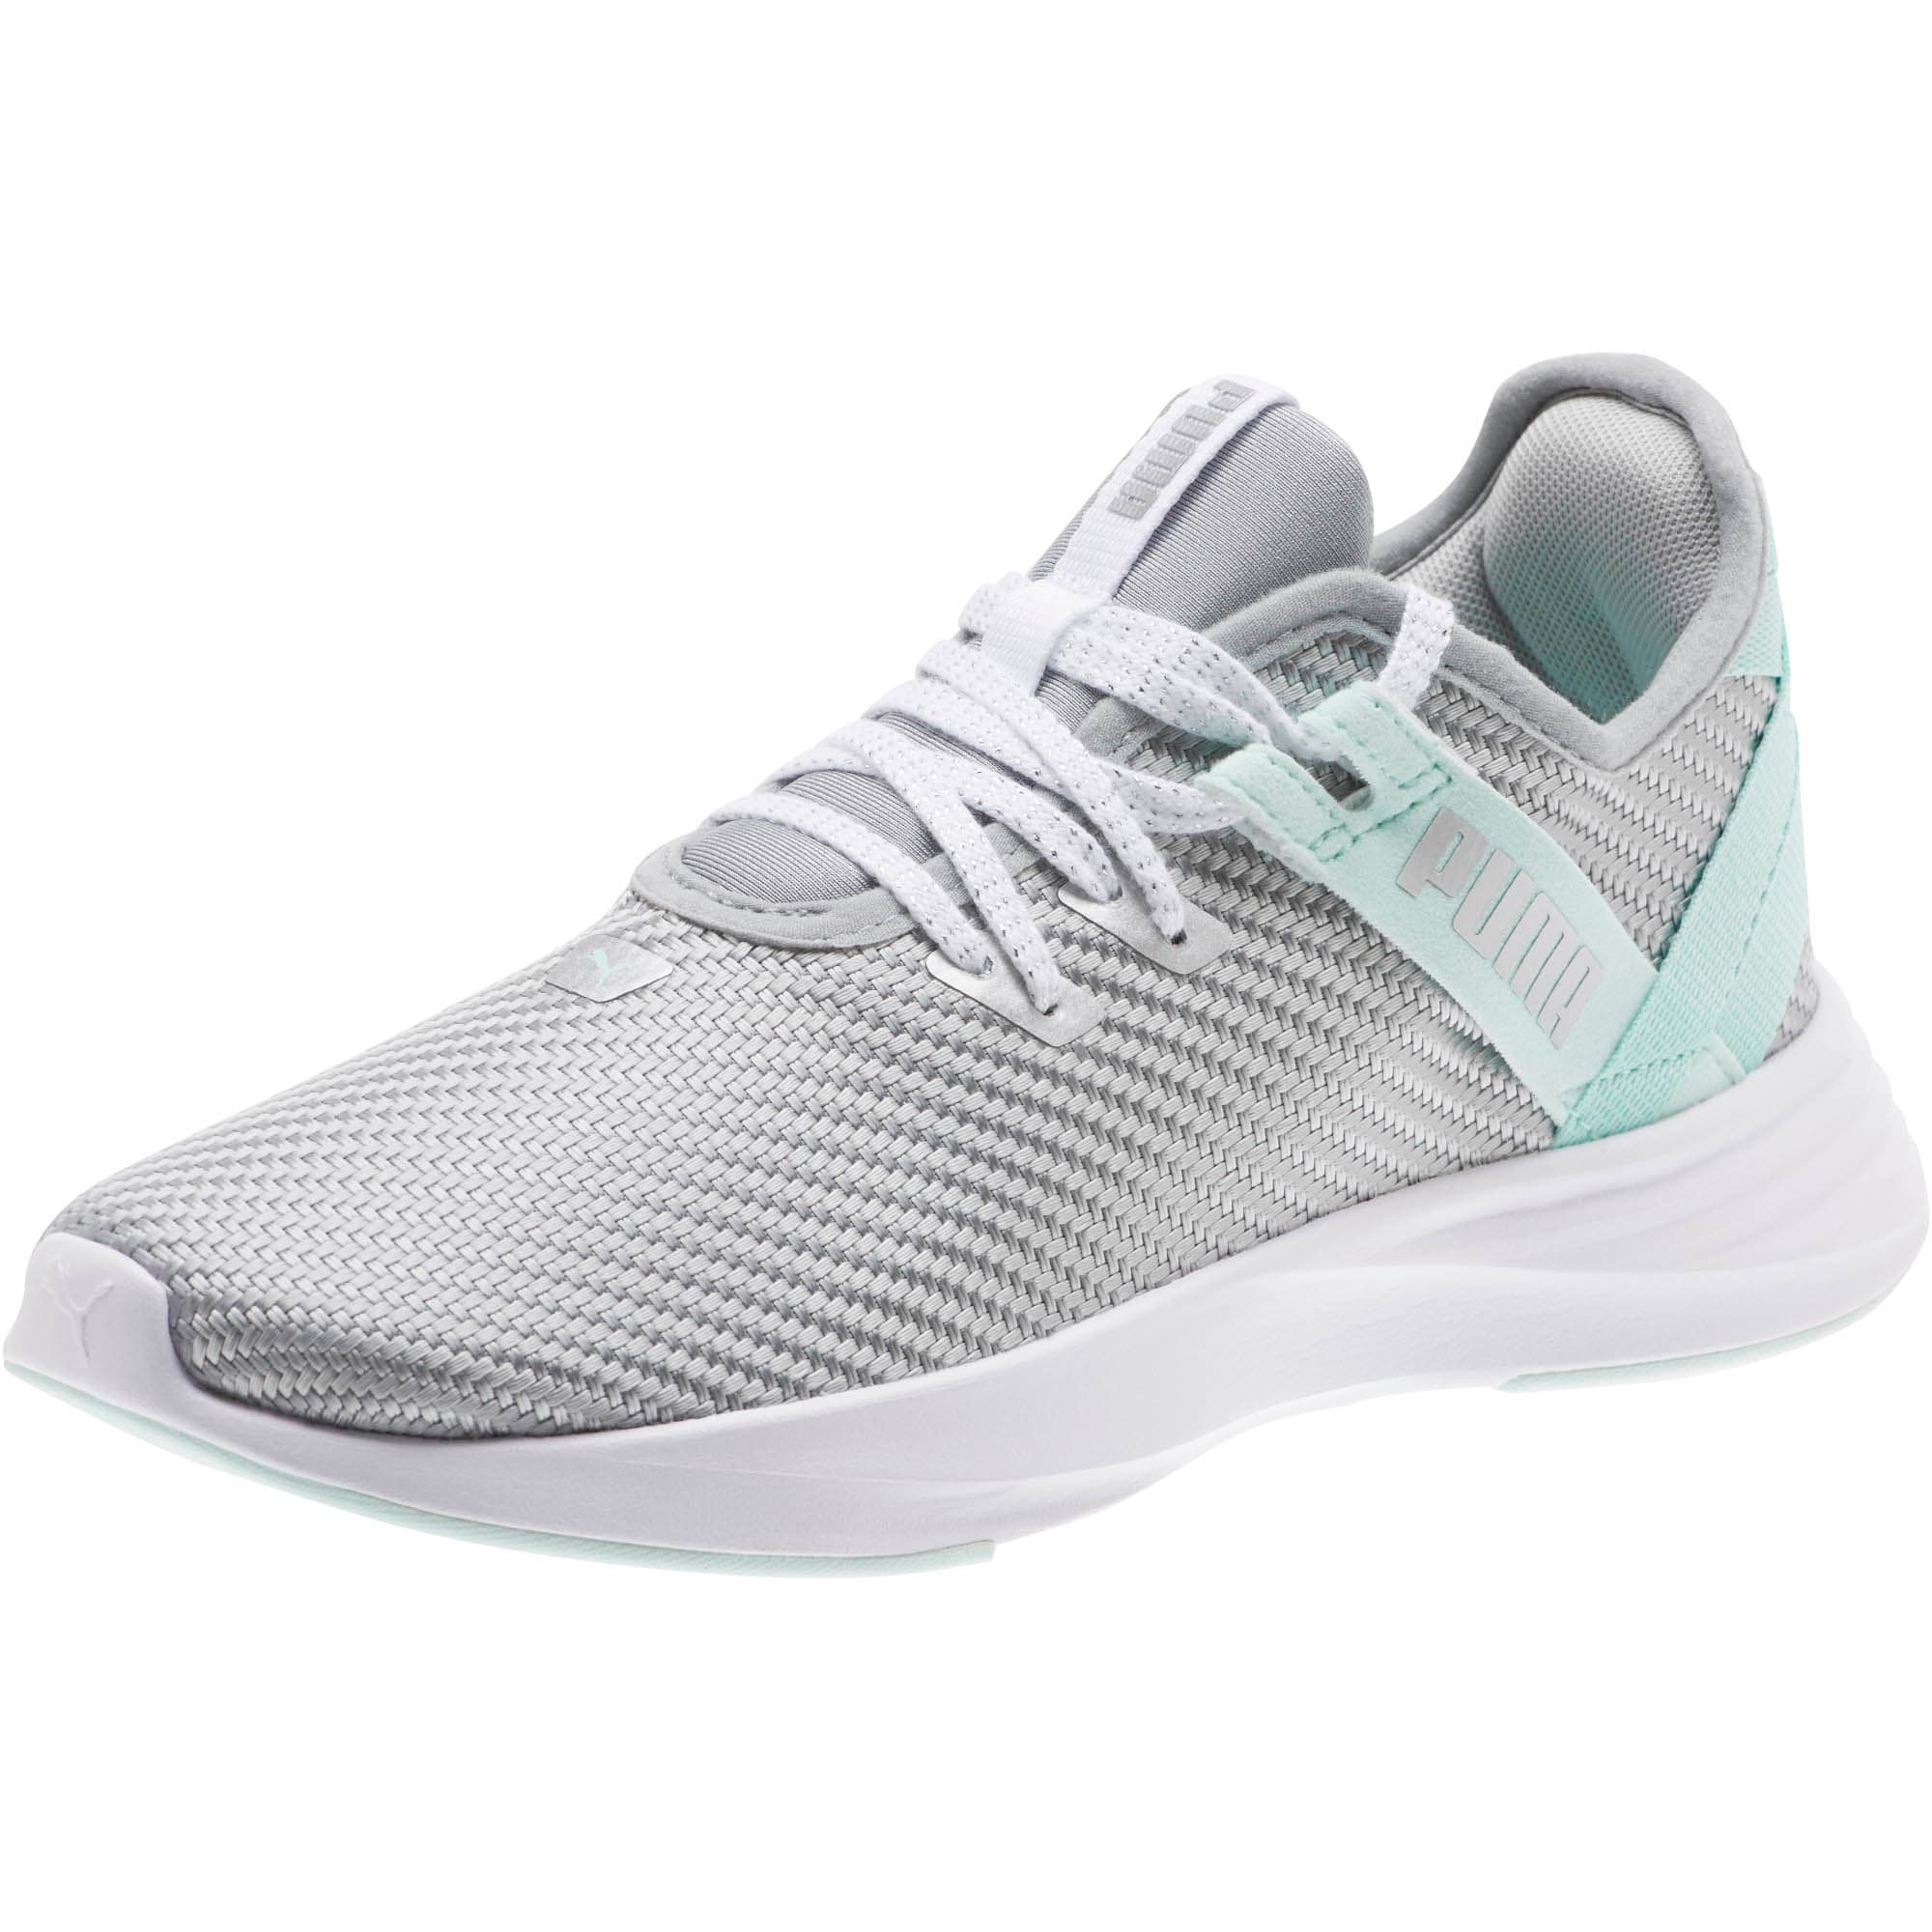 Thumbnail 1 of Radiate XT Cosmic Women's Training Shoes, Puma Silver-Fair Aqua, medium